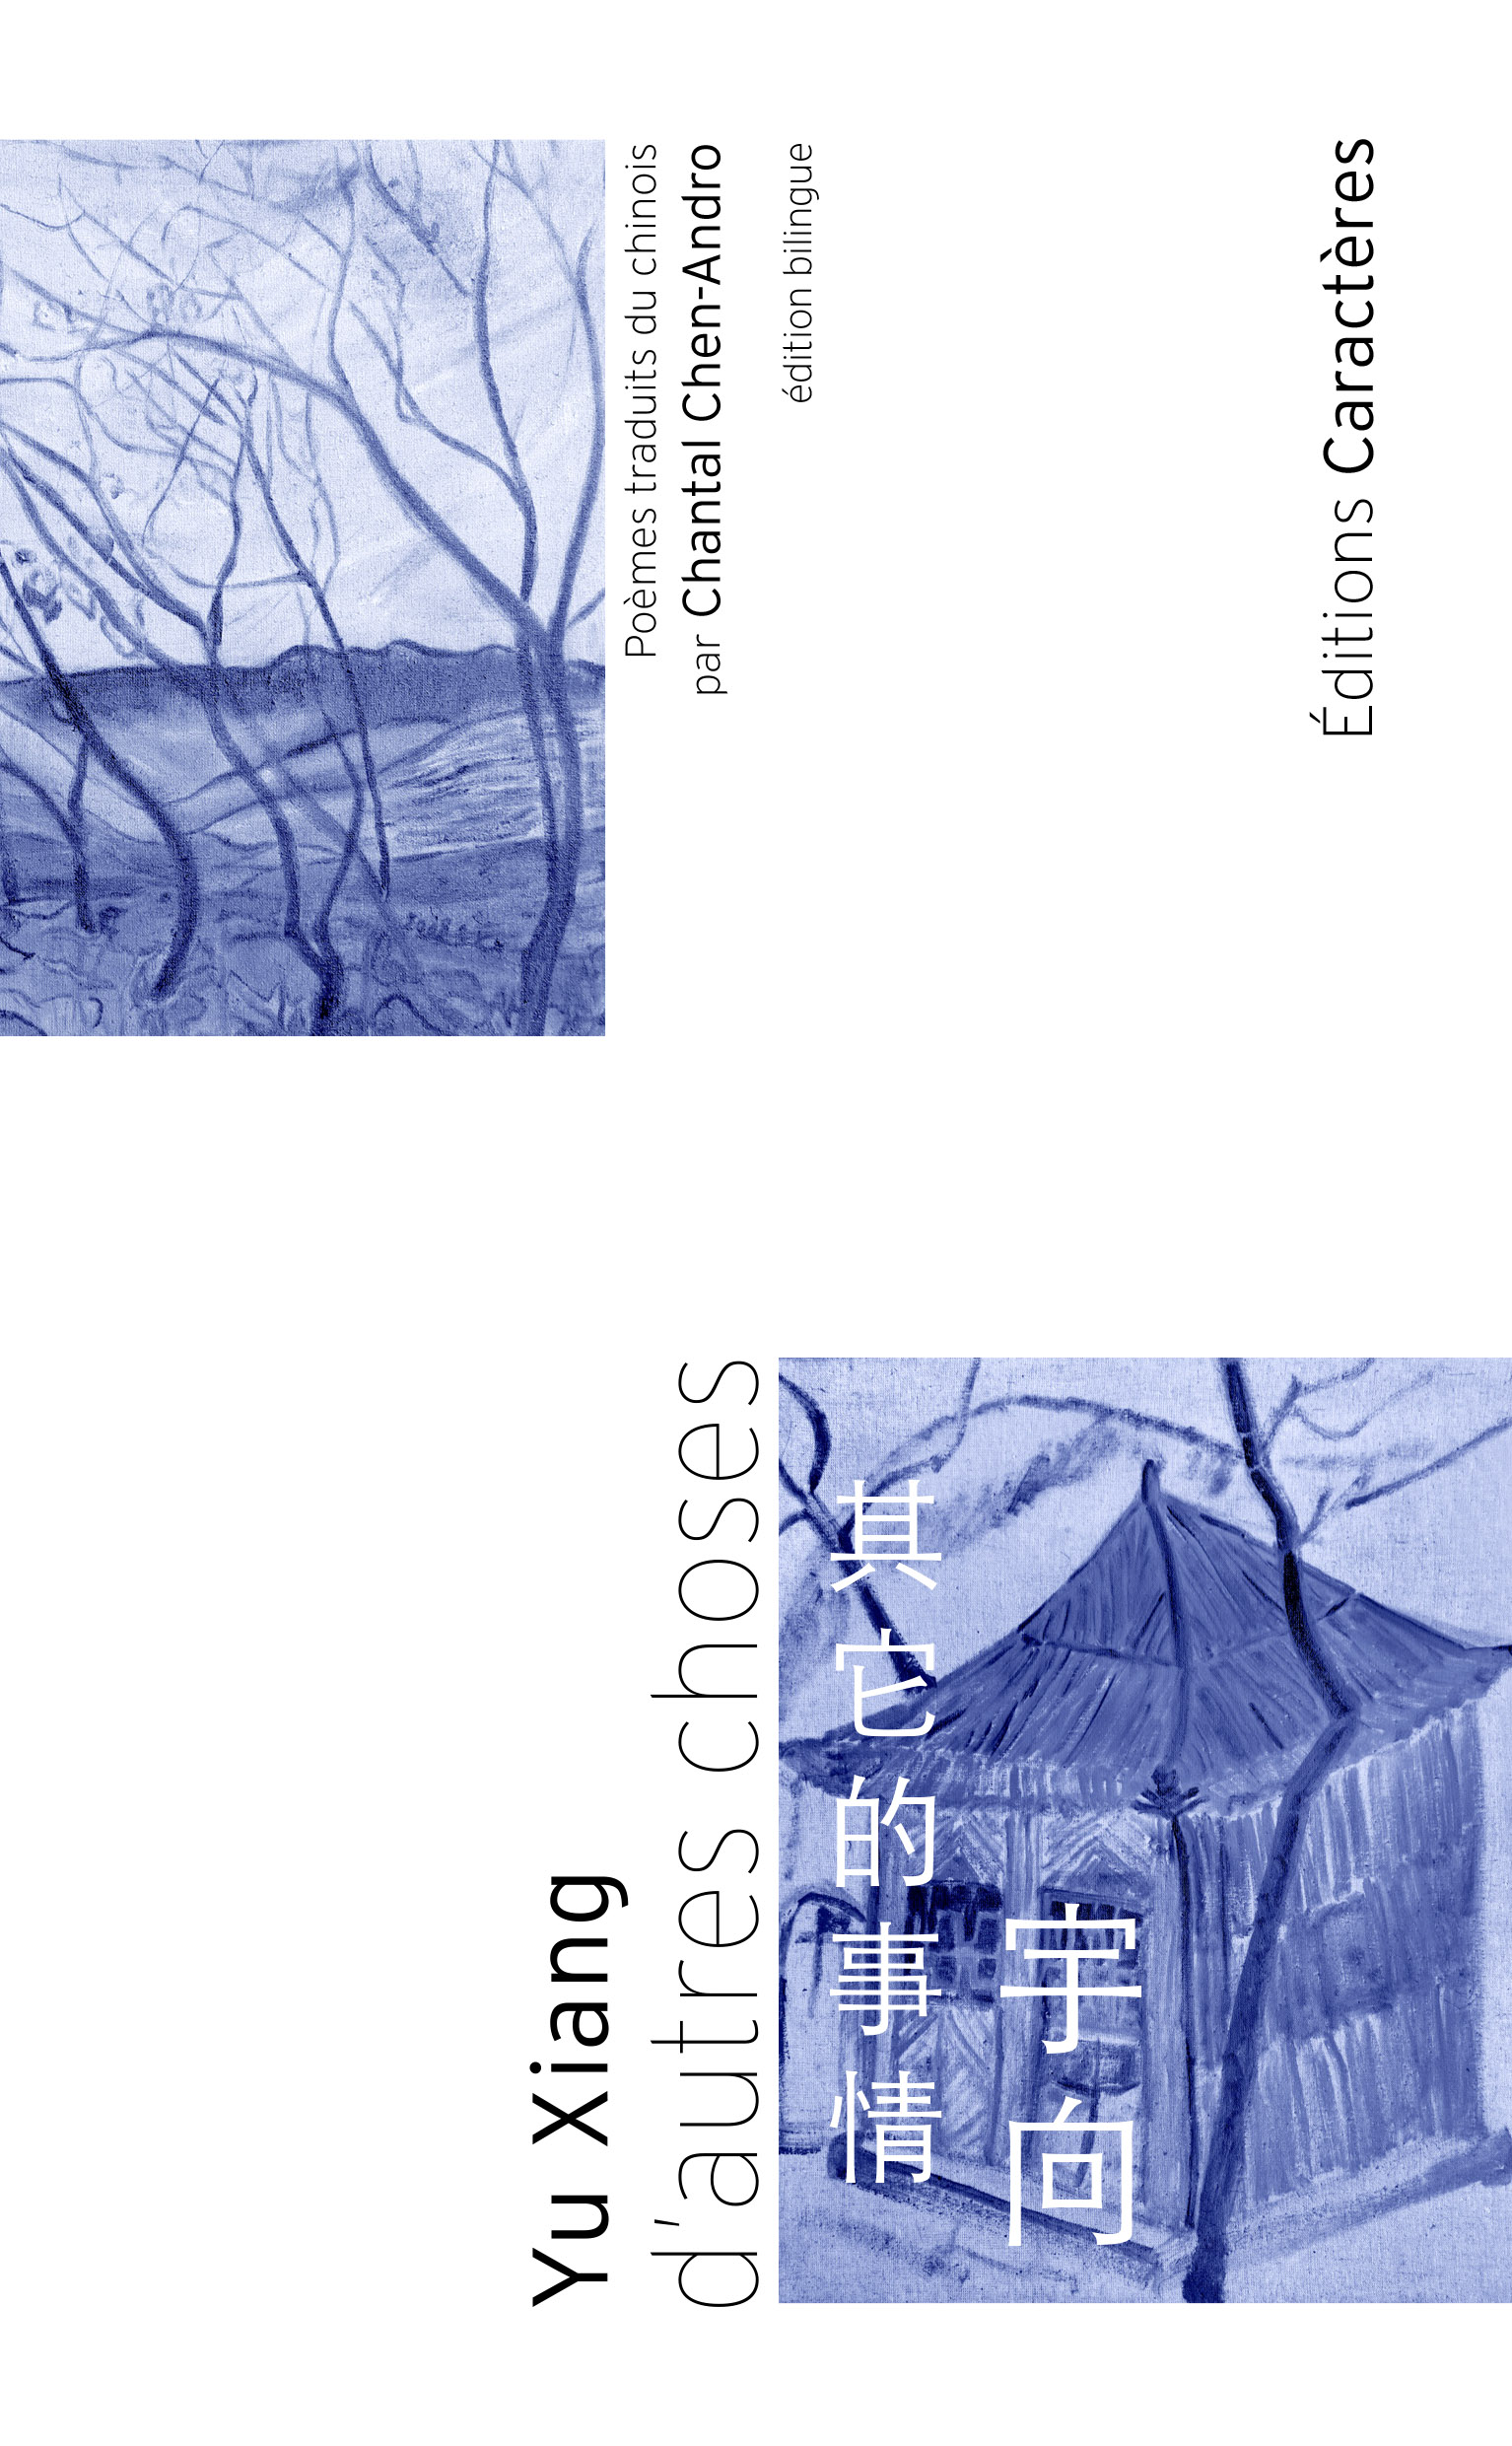 03-d'autres choses -Yu Xiang